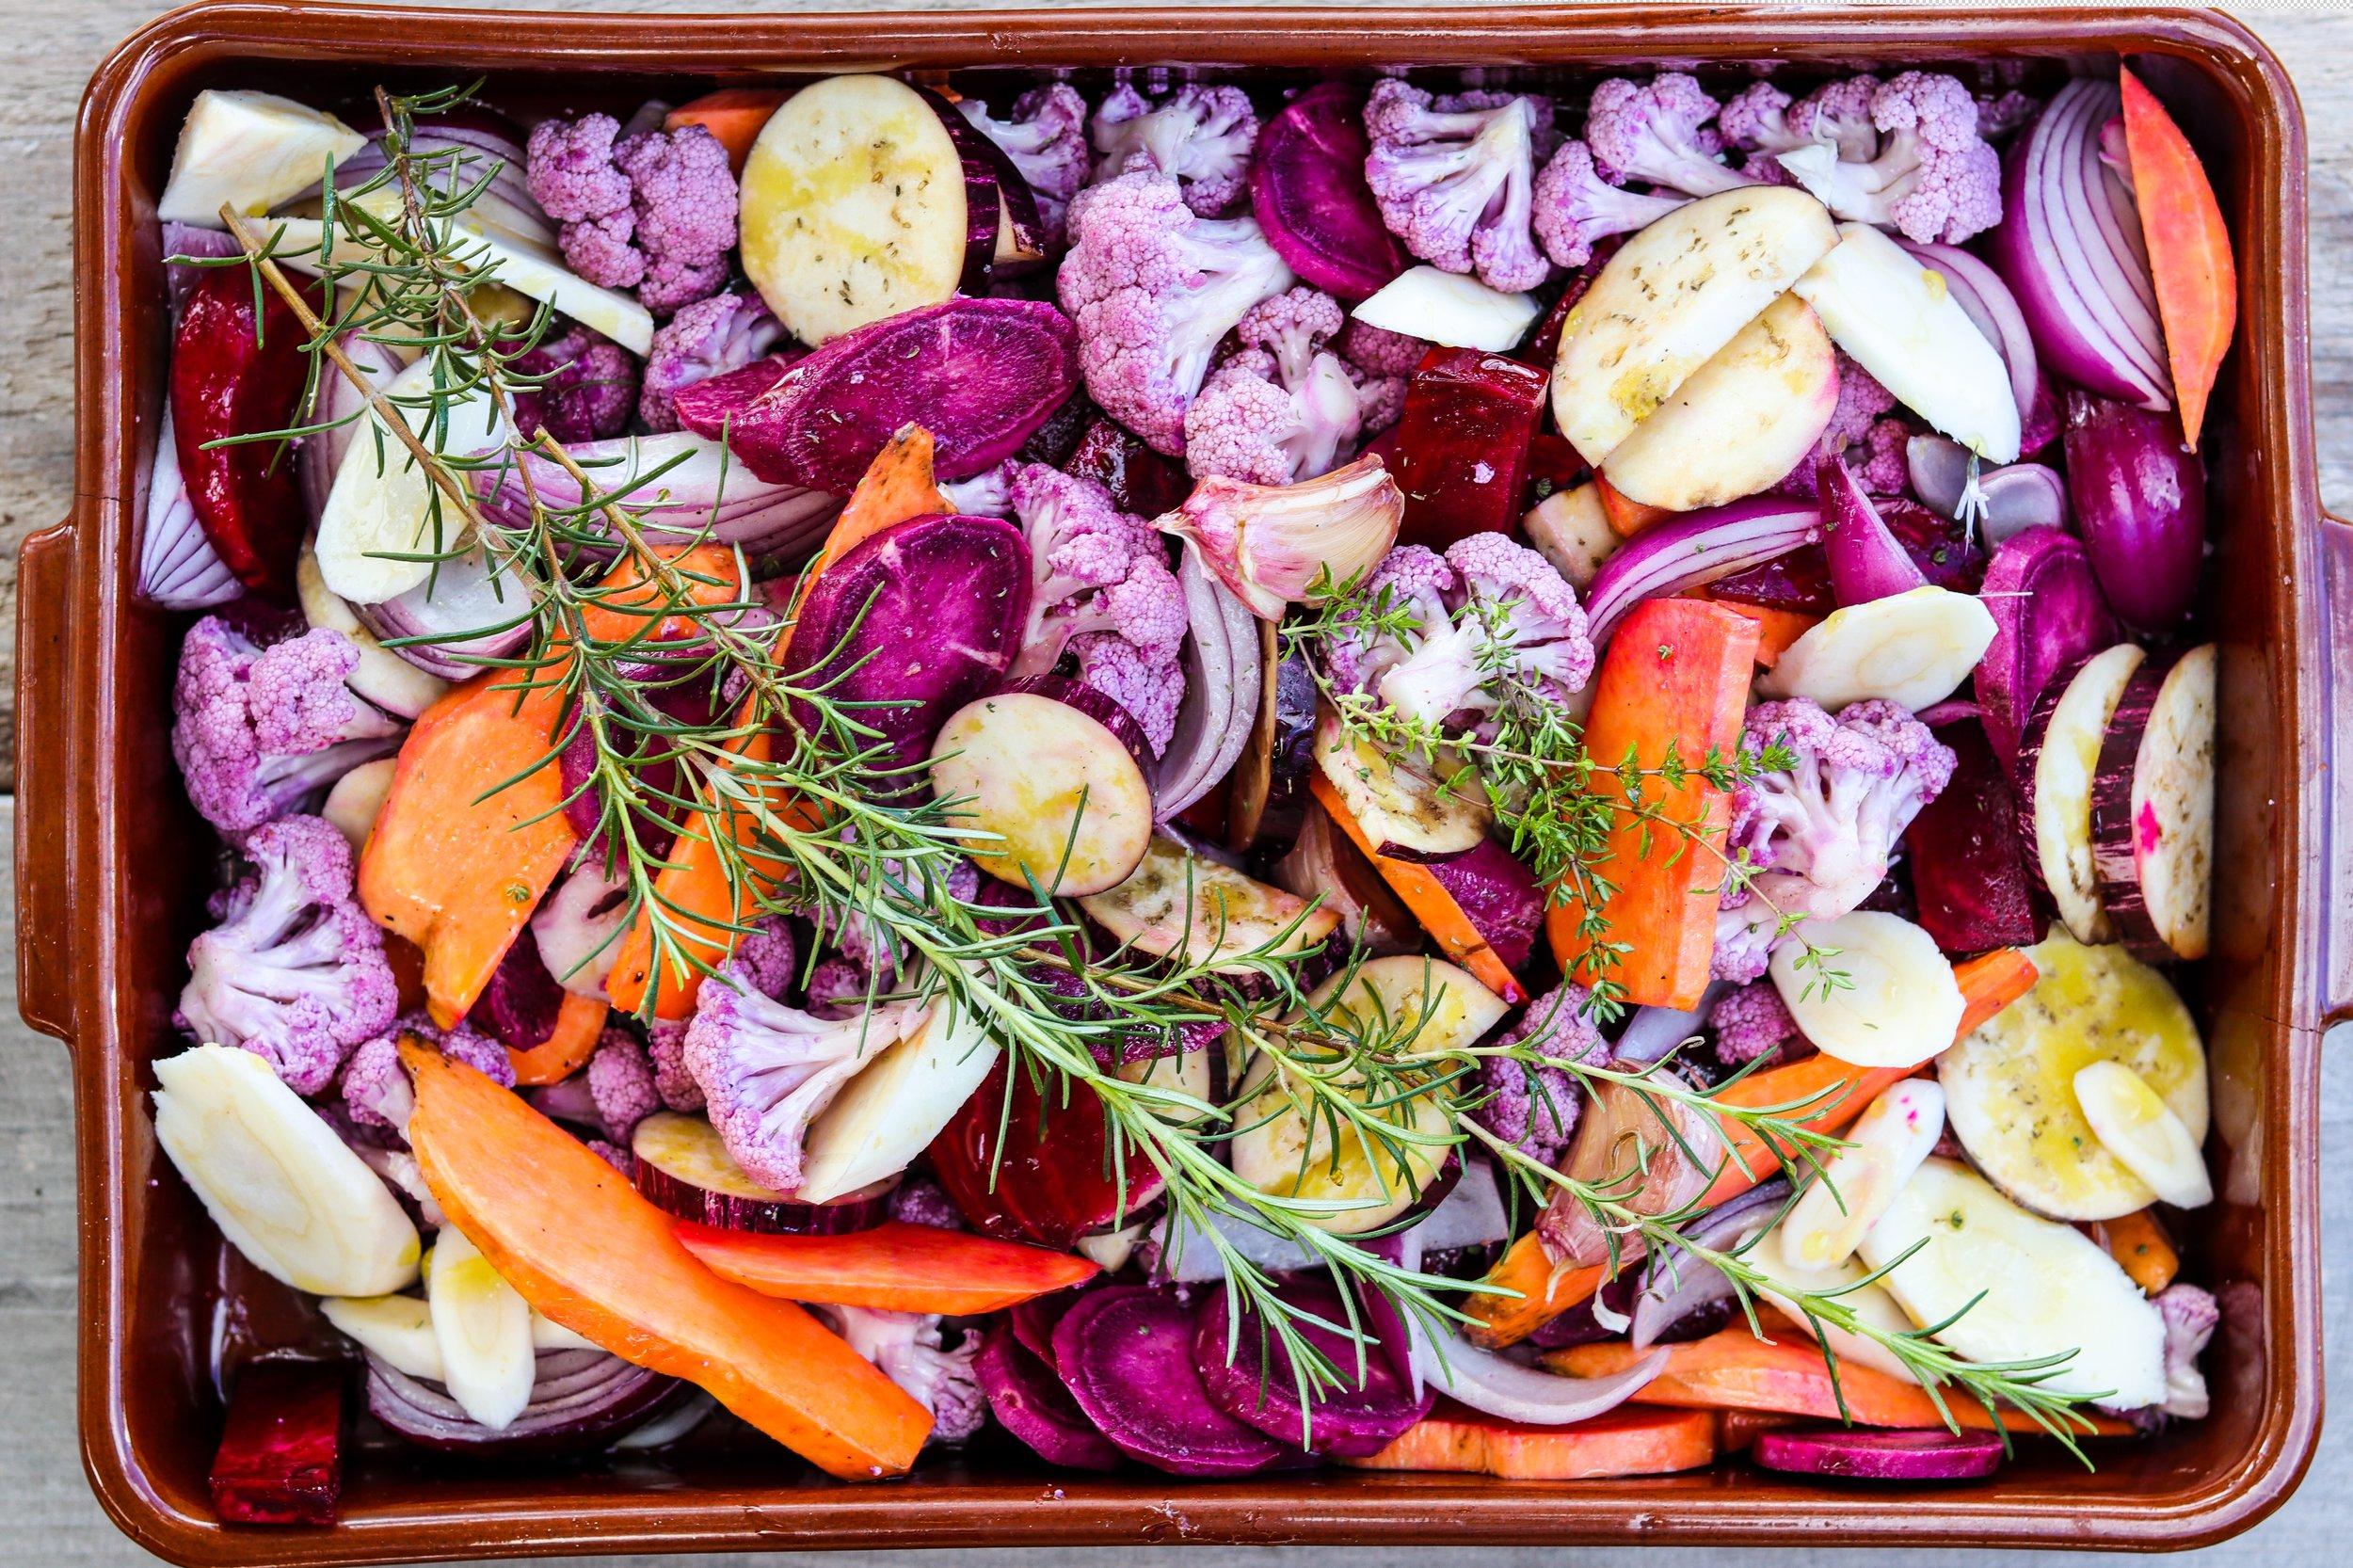 Mediterranes buntes Ofengemüse mit Fete-Joghurt-Salsa